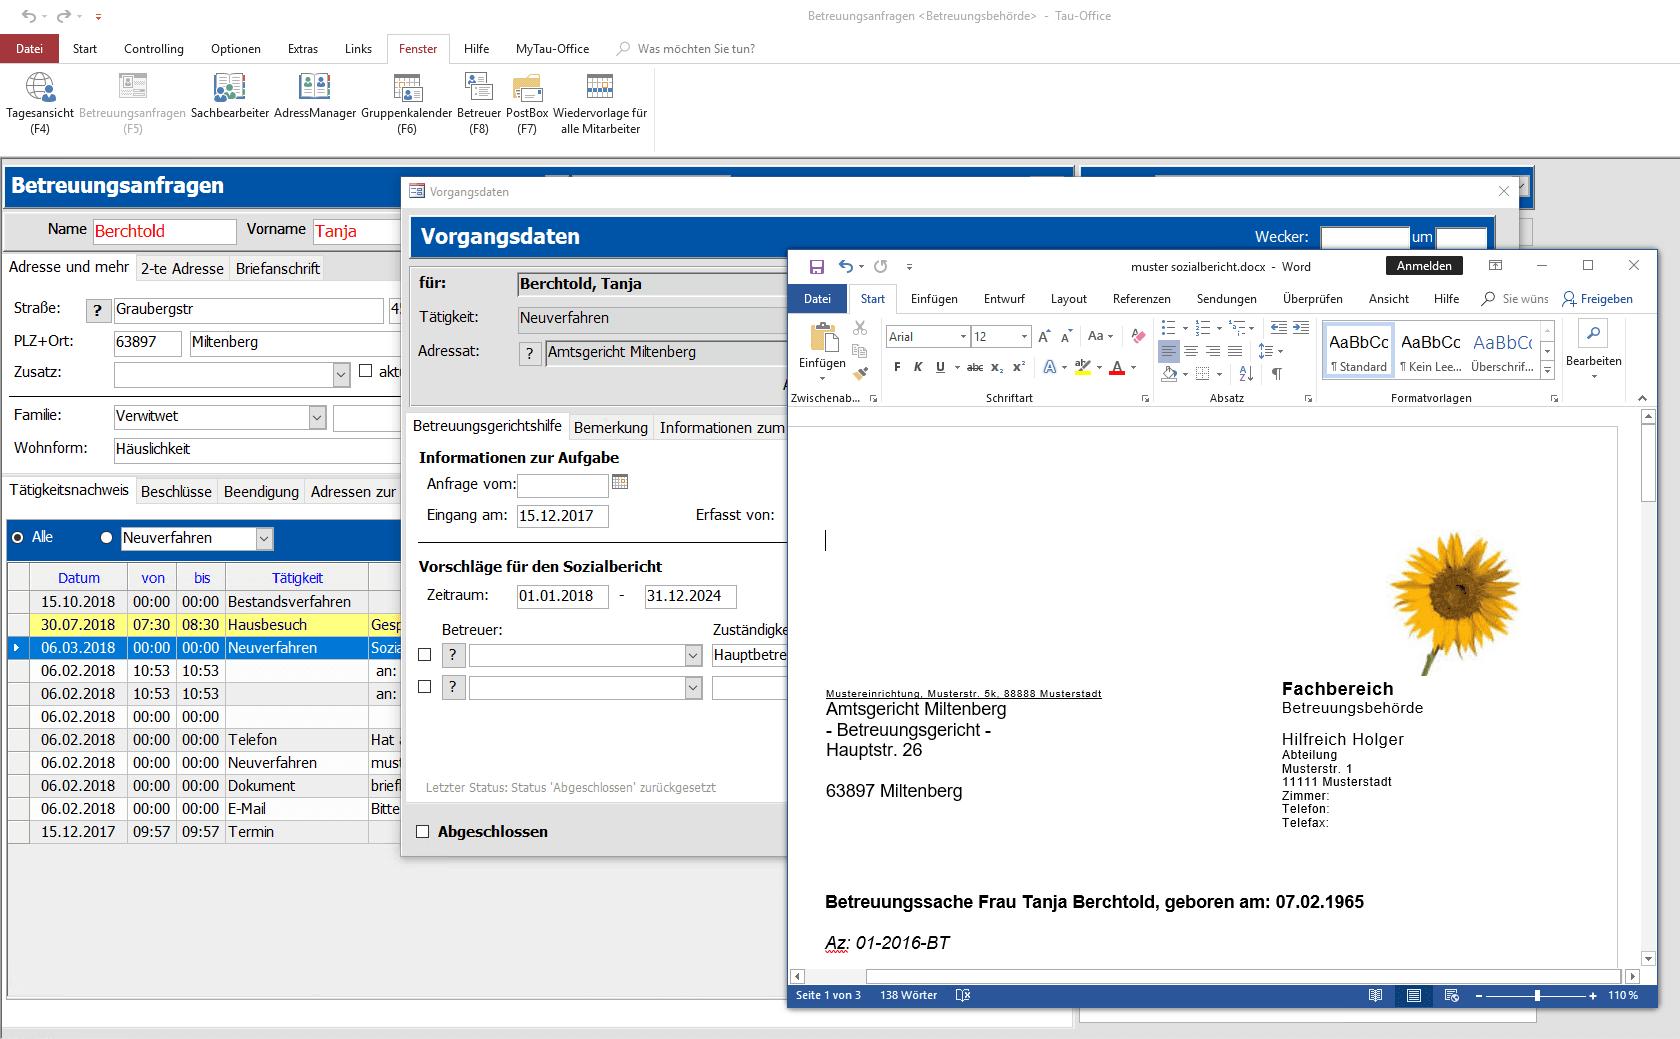 Vorgangsdaten mit Musterbrief Tau-Office BetreuungsManager